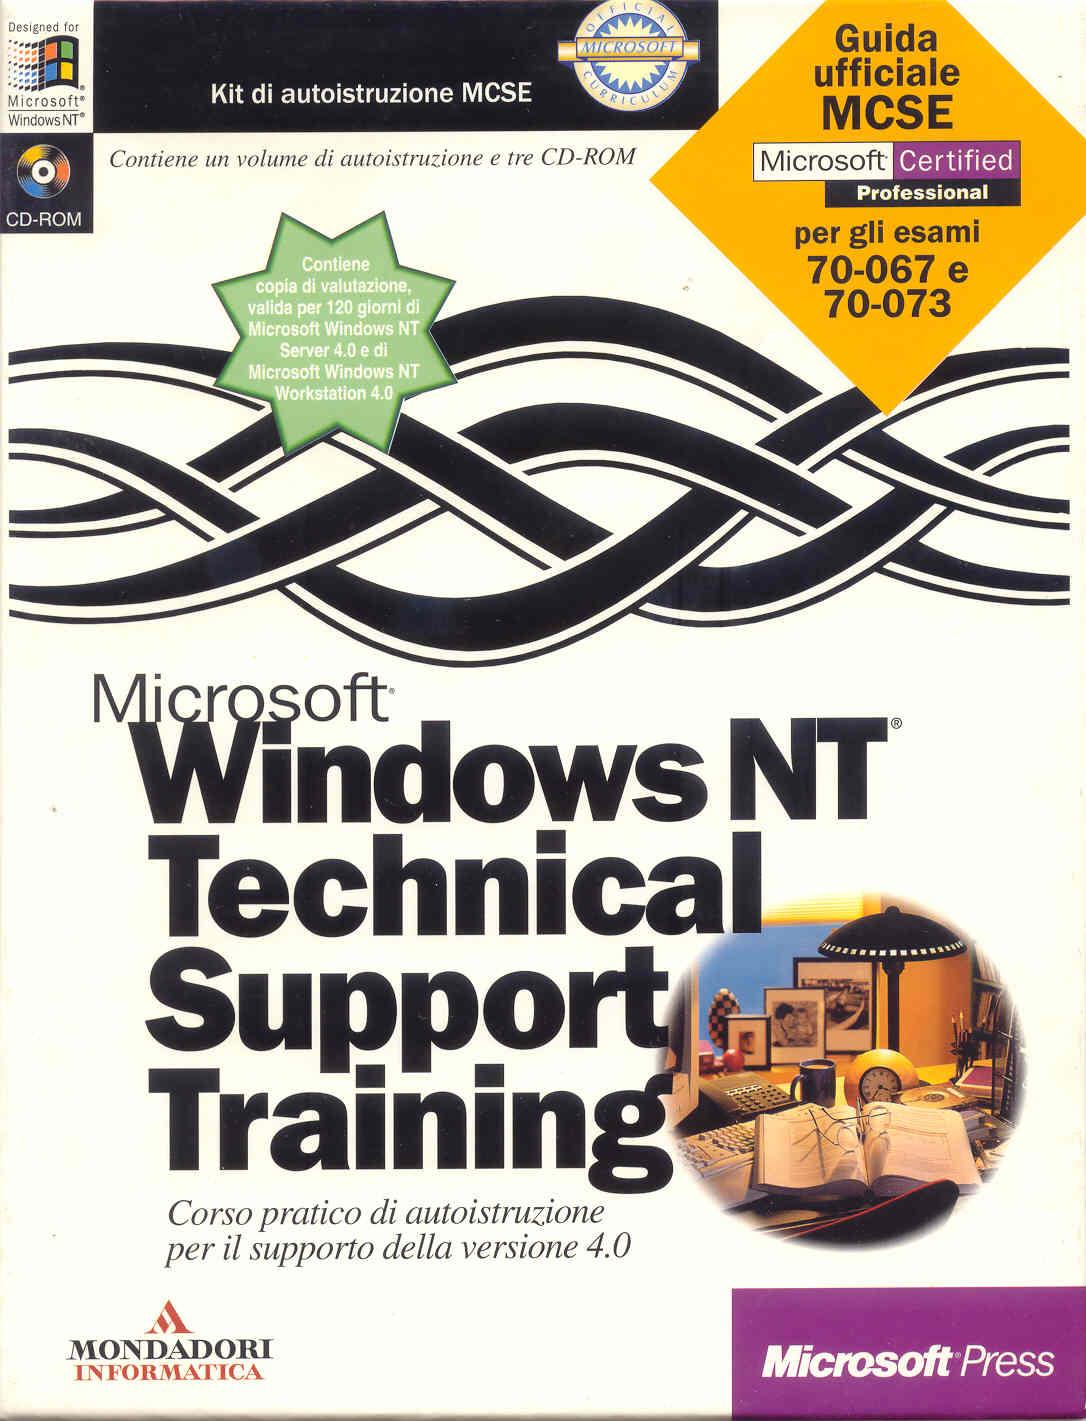 Microsoft Windows NT Technical Support Training